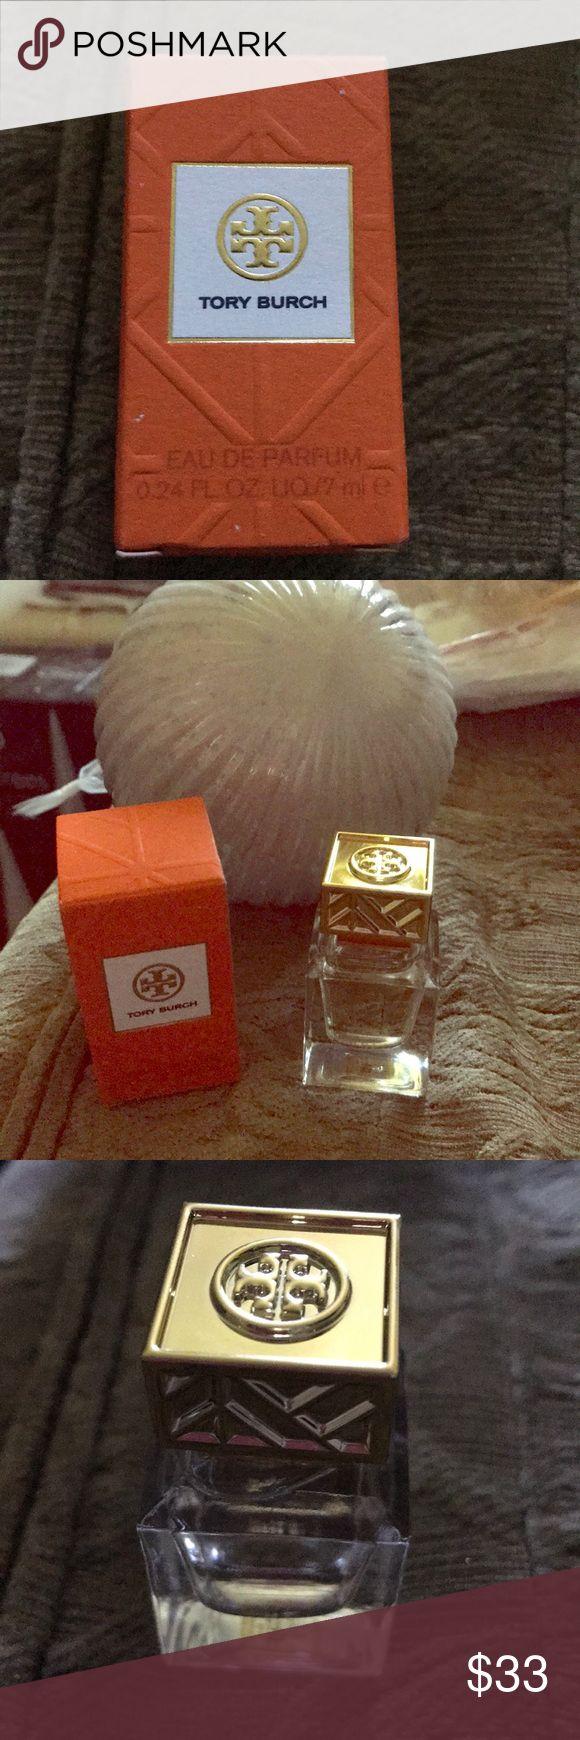 Tory Burch EAU de PARFUM .24 oz new in box Great little stocking stuffer Tory Burch Perfume NIB .24 oz pretty gold cap. Smells amazing! Nice gift or keep it for yourself! Tory Burch Other